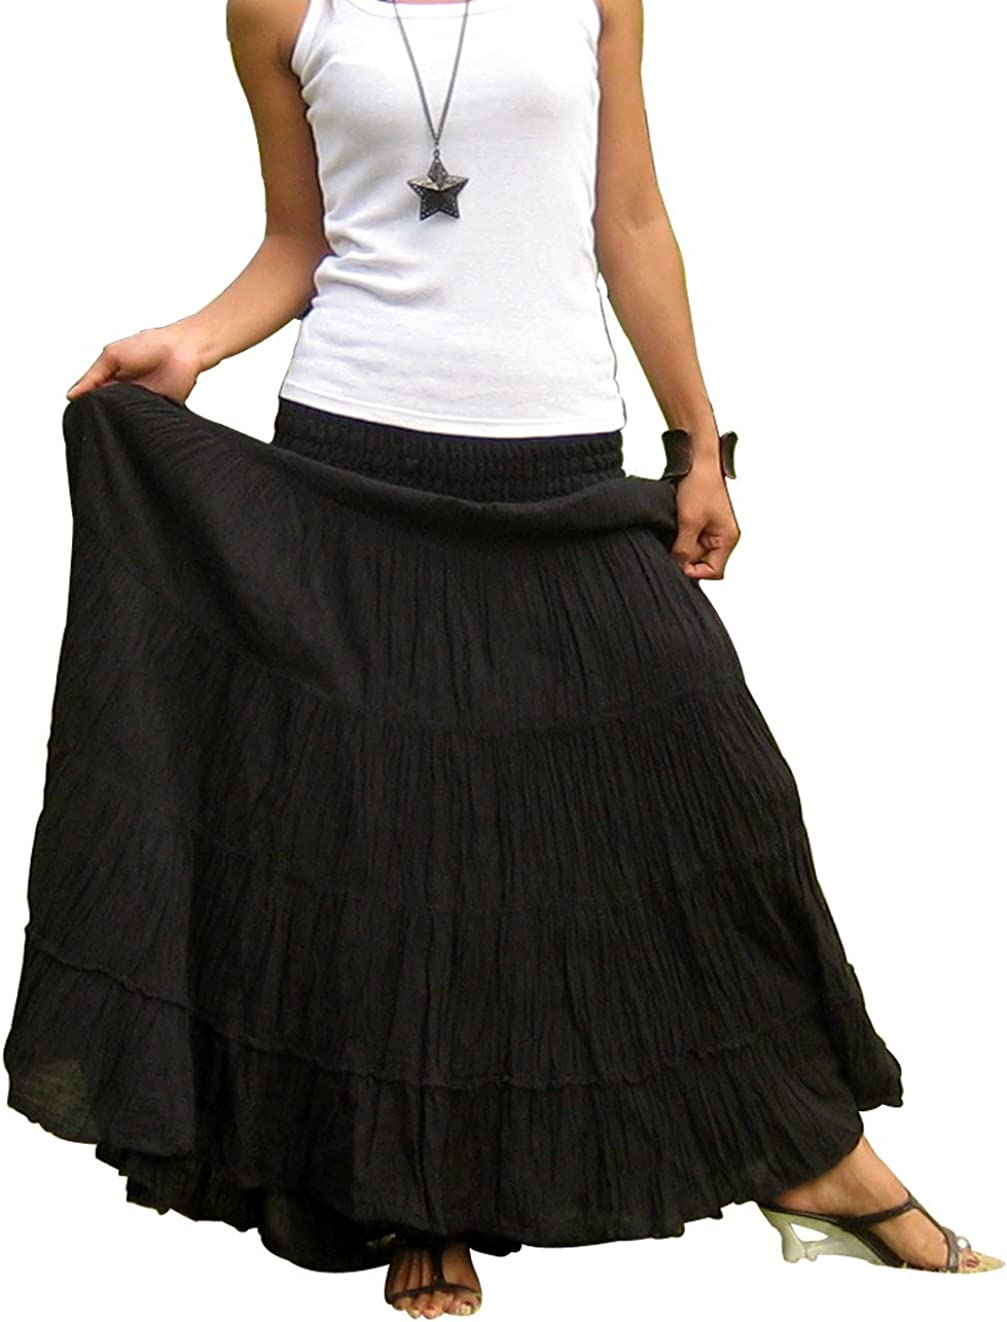 Billy's Thai Shop Plus Size Maxi Skirt Long Skirts for Women Handmade Tiered Skirt